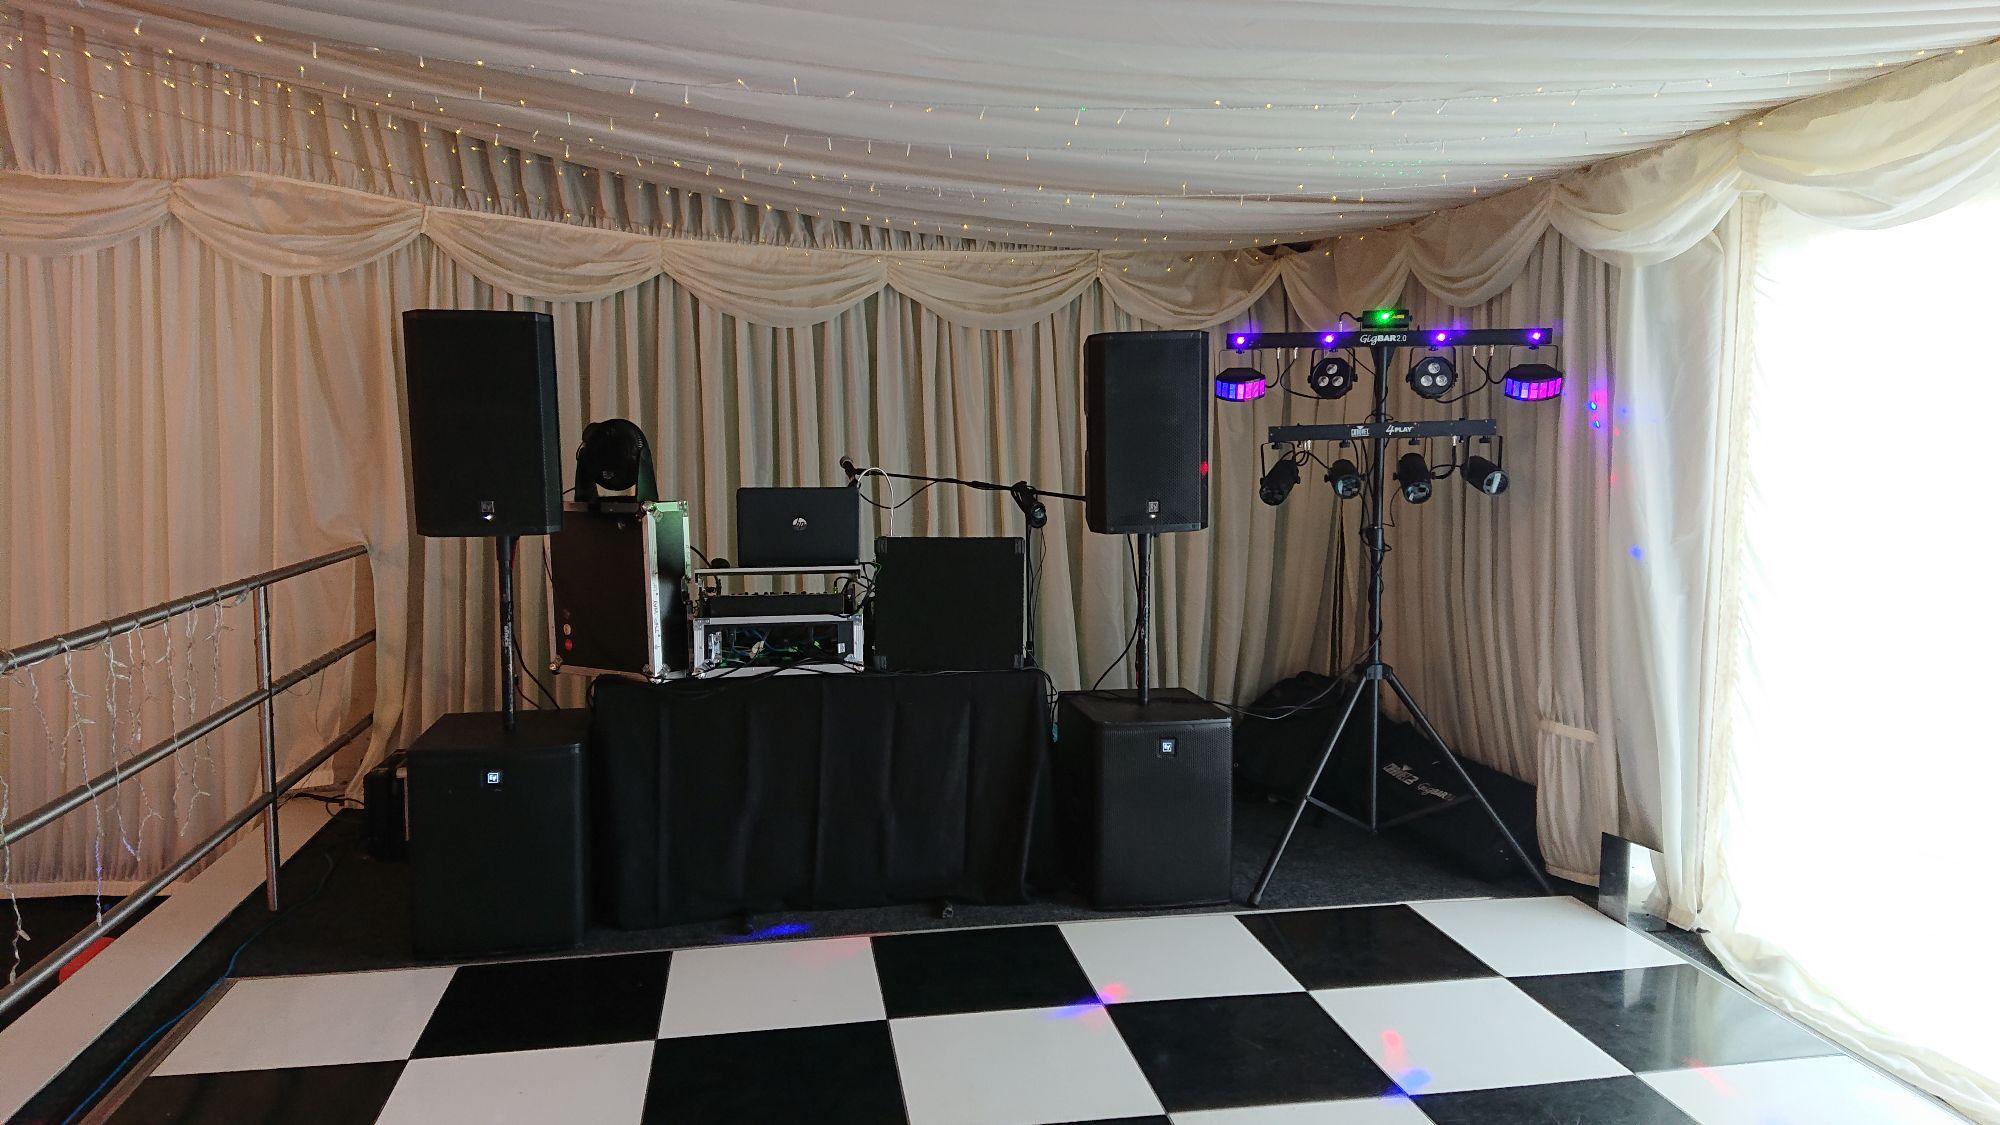 Wedding disco at Seldon farm barn 2018